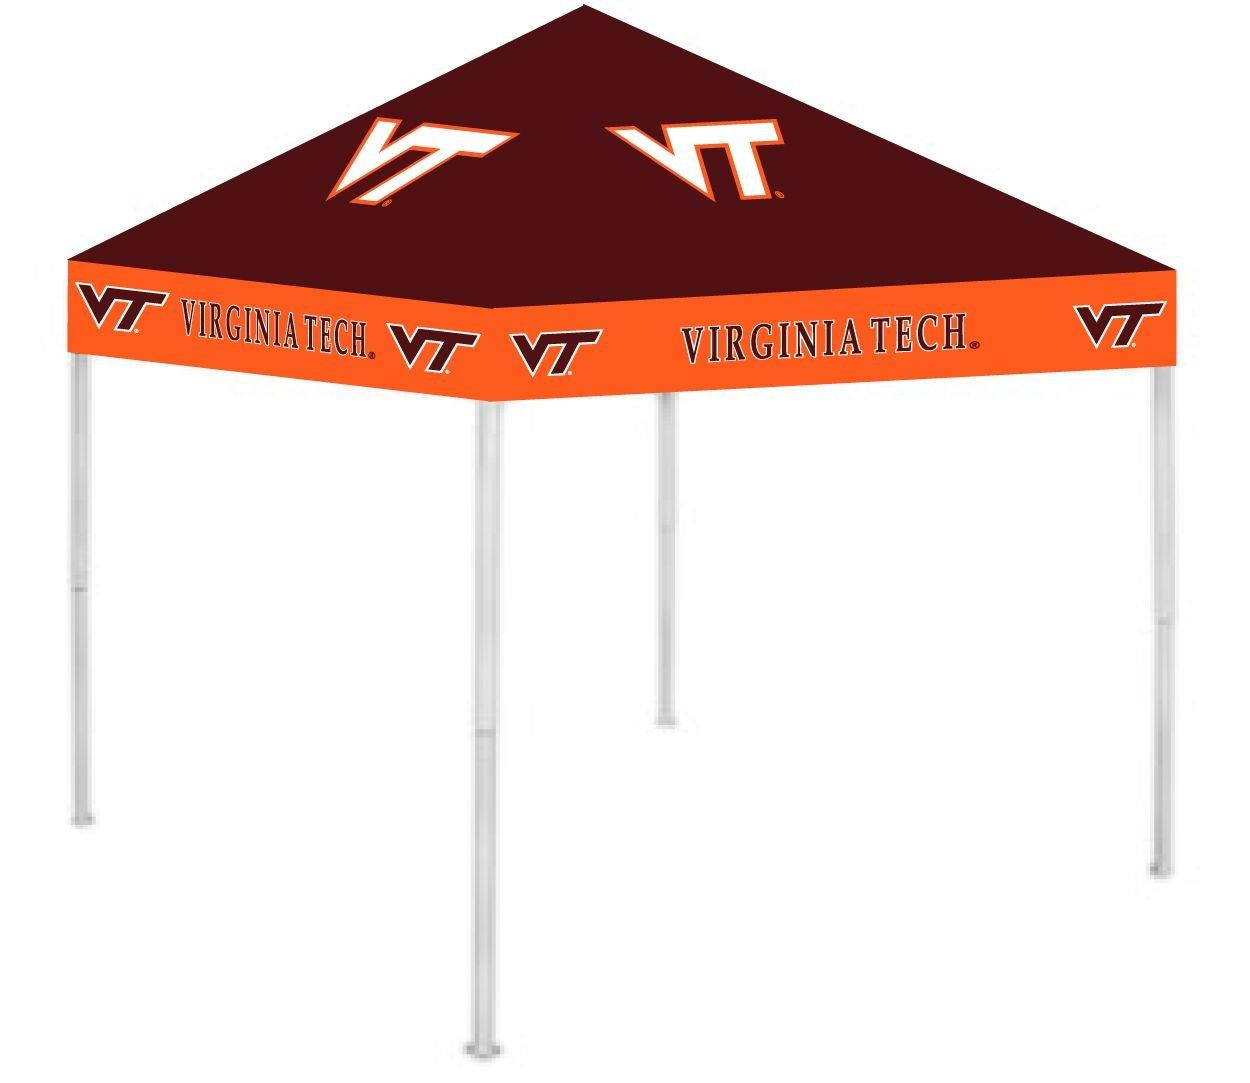 Amazon.com  Rivalry NCAA Alabama Crimson Tide Canopy  Sports Fan Canopies  Sports u0026 Outdoors  sc 1 st  Amazon.com & Amazon.com : Rivalry NCAA Alabama Crimson Tide Canopy : Sports Fan ...